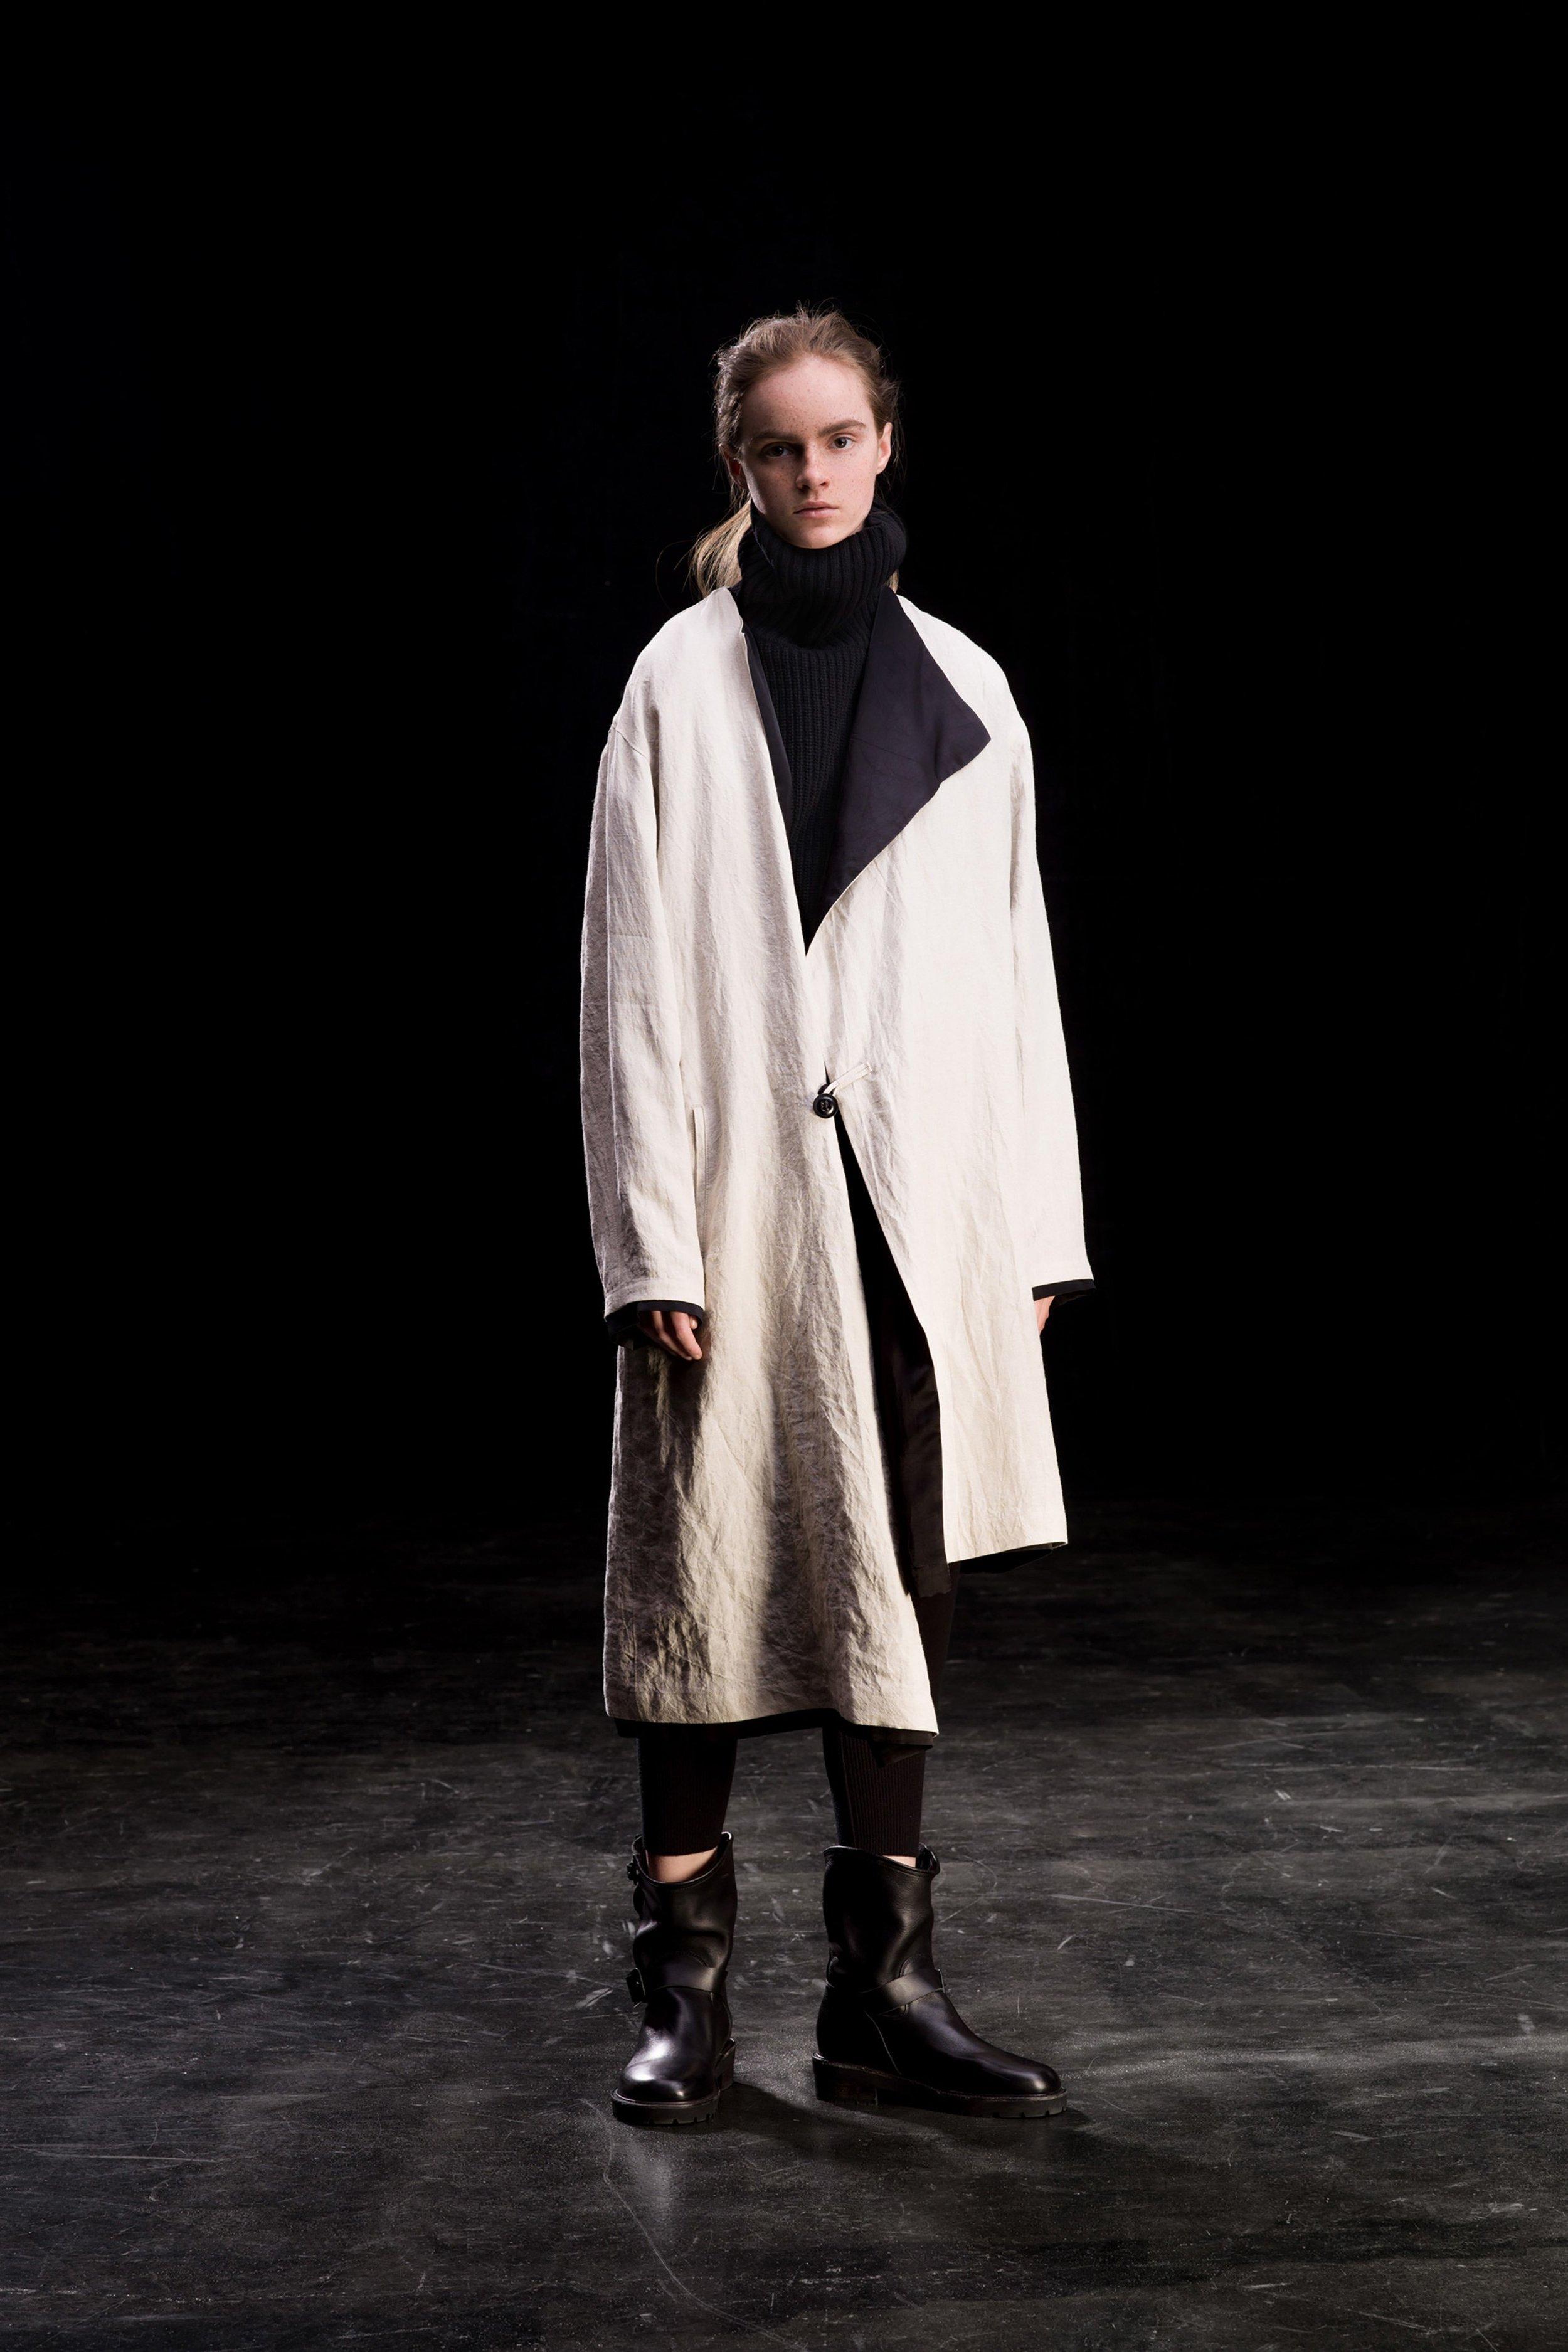 00009-Ys-Yohji-Yamamoto-FALL-19-Ready-To-Wear.jpg